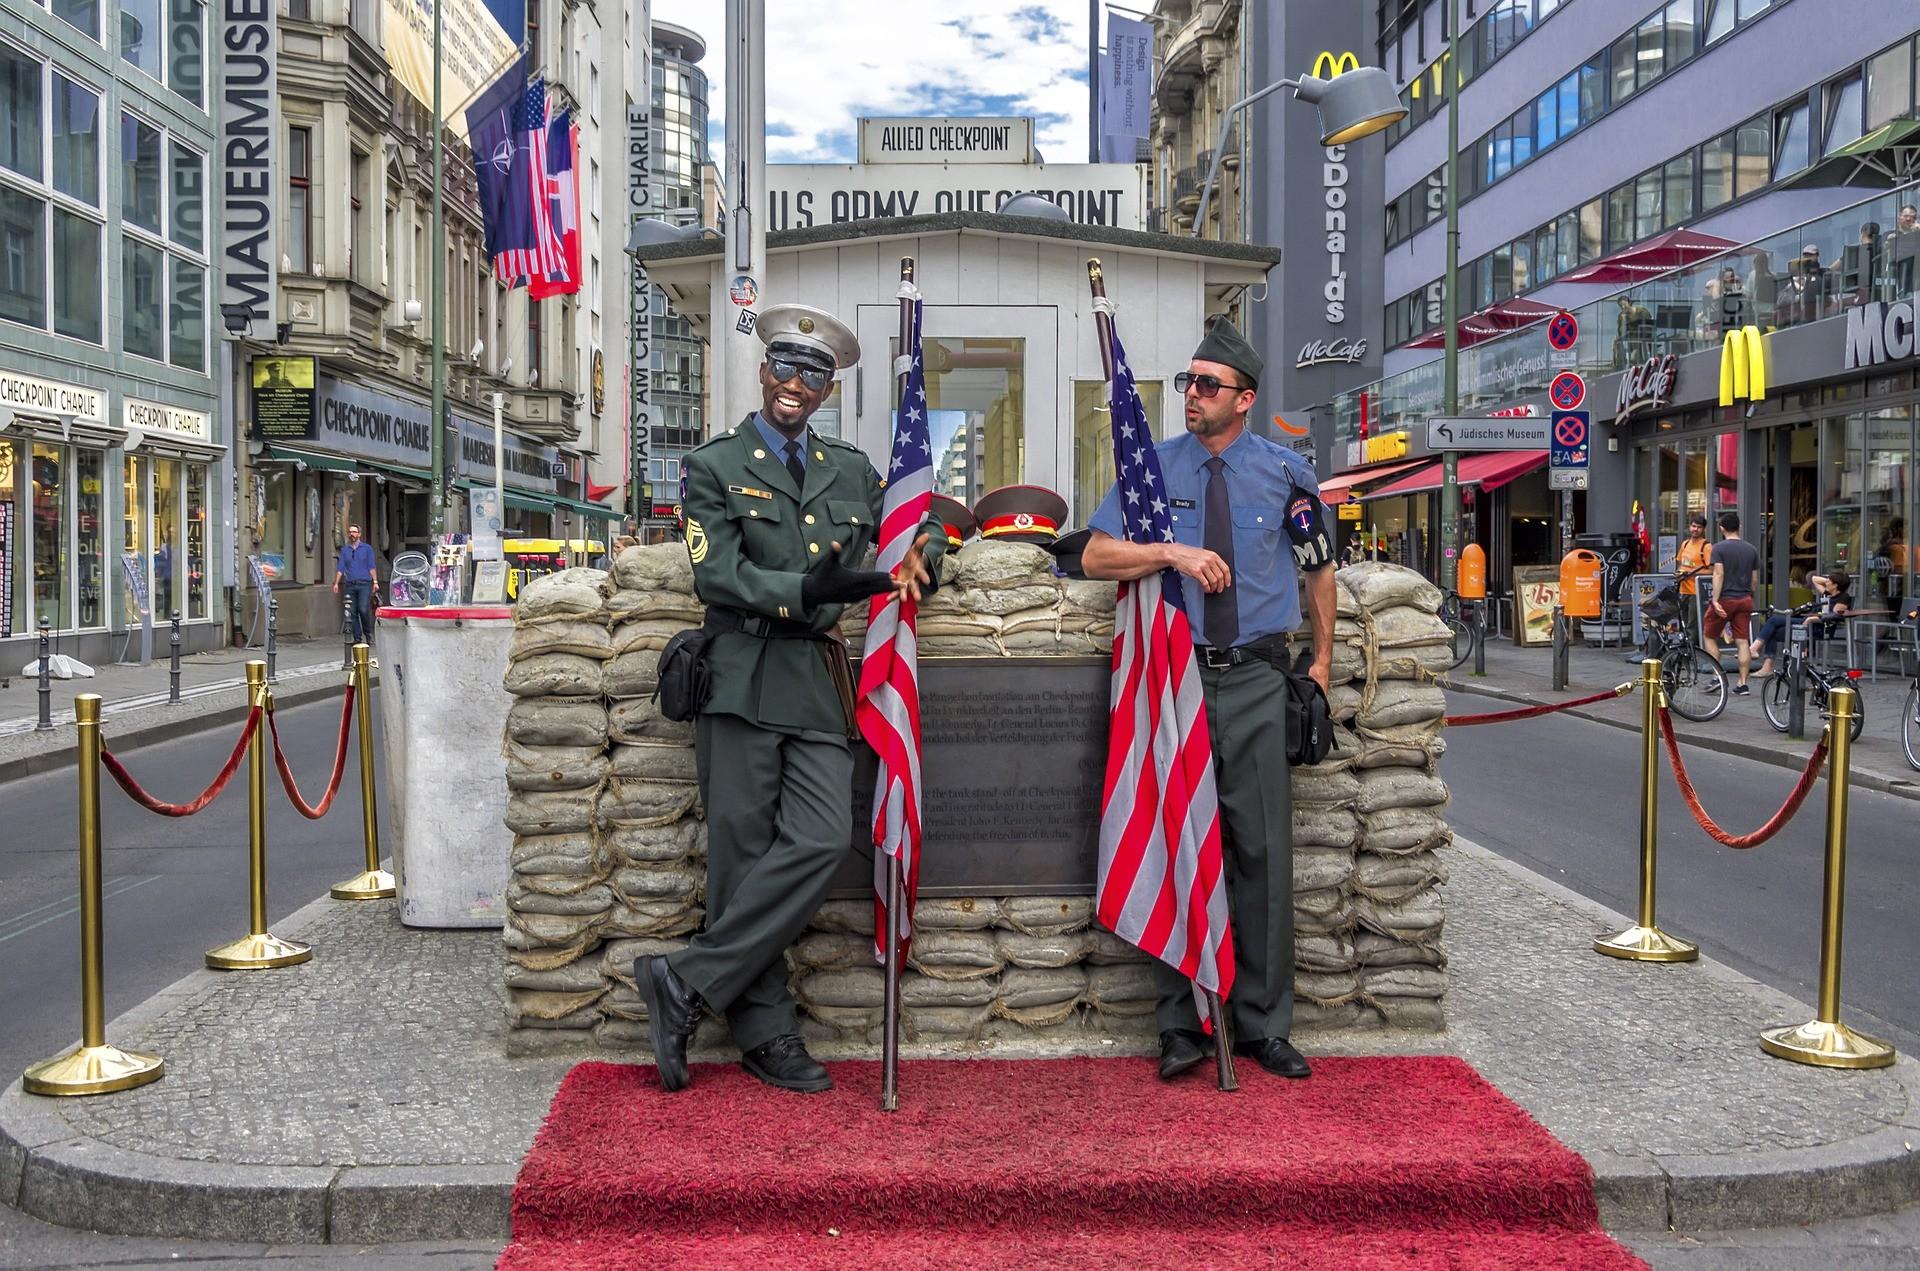 Berlino punti di interesse: Checkpoint Charlie, Berlino - Foto di Piet van de Wiel